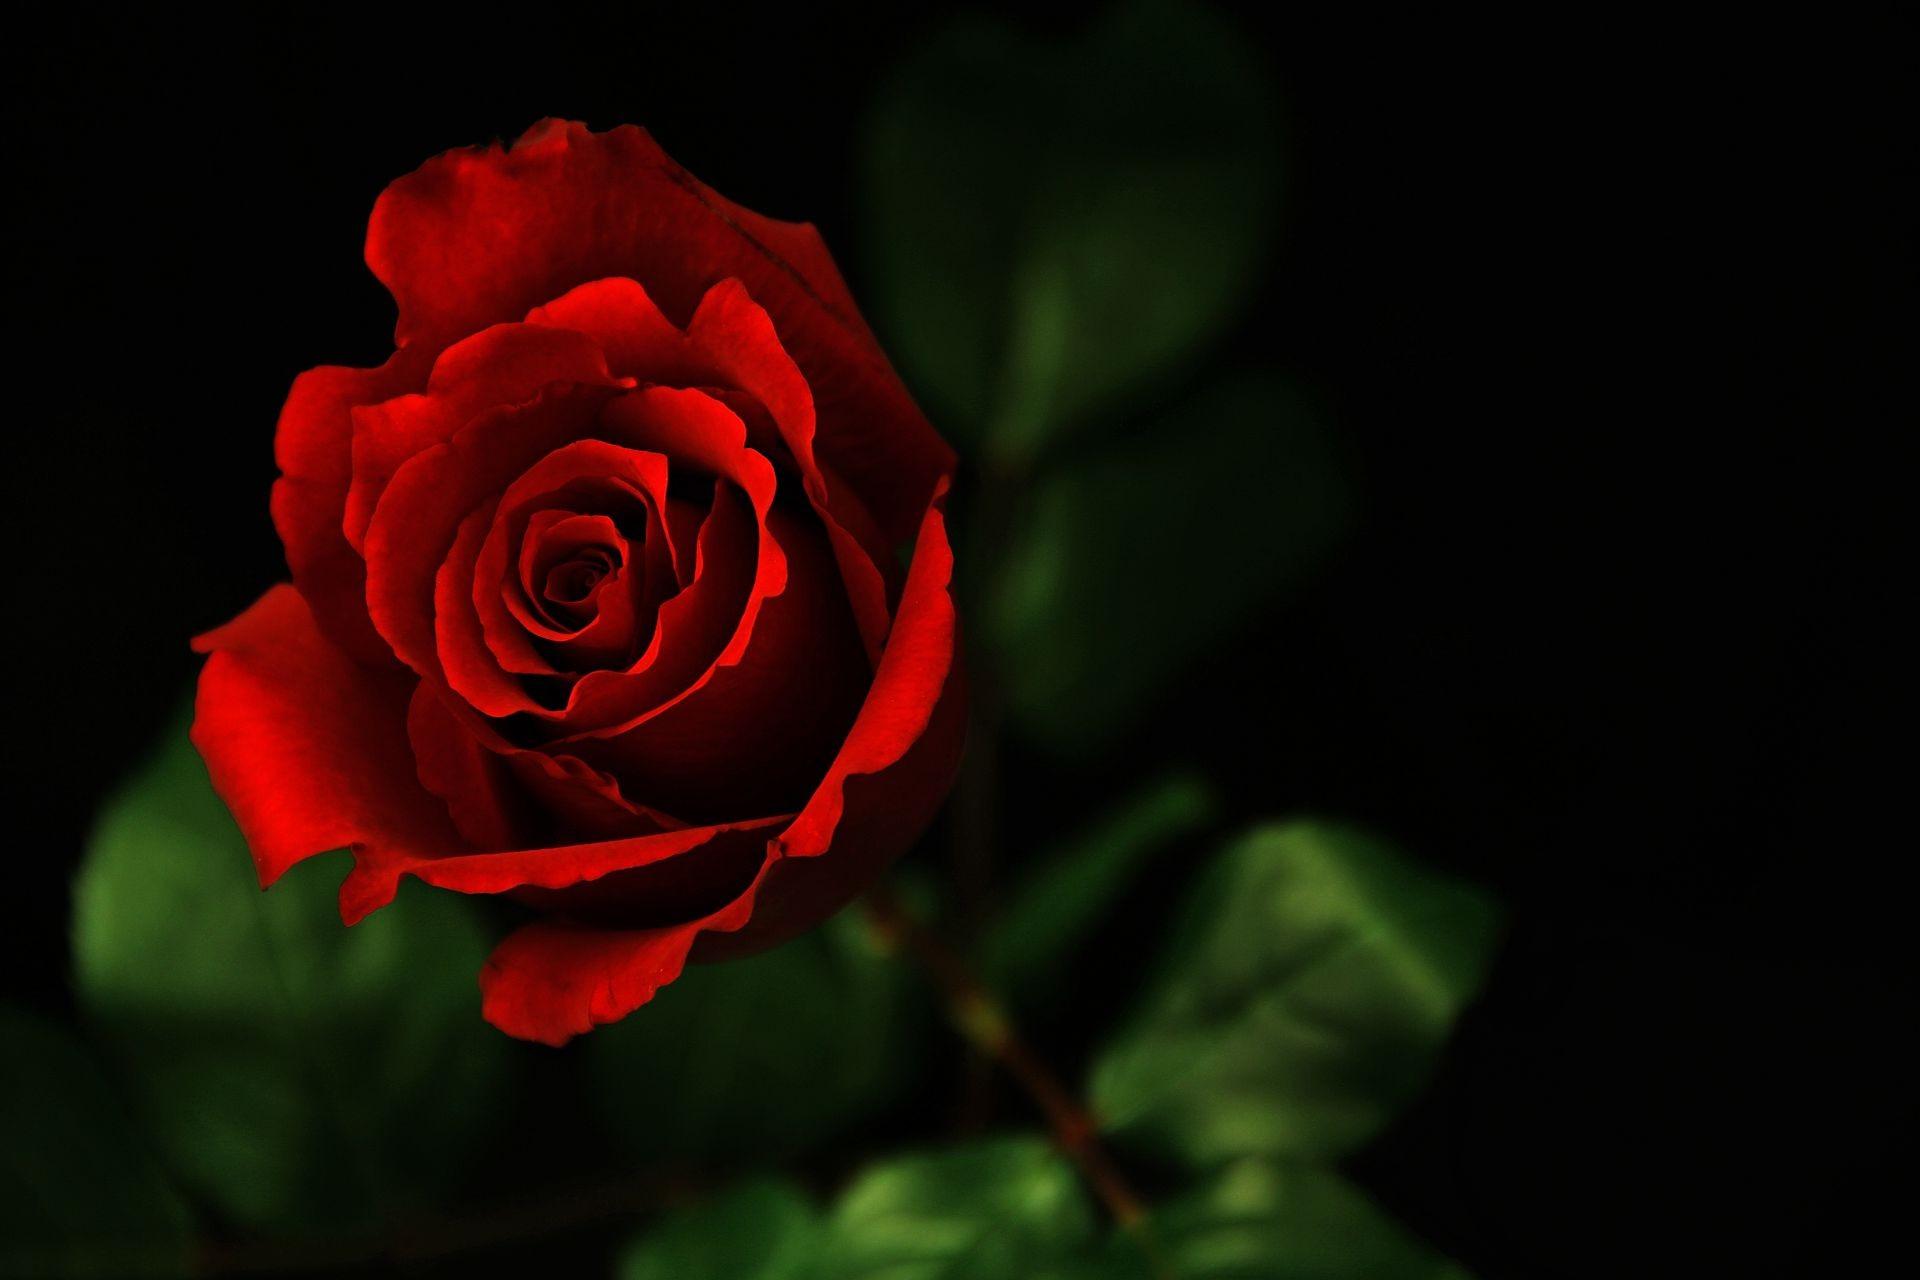 Роза обои на рабочий стол hd